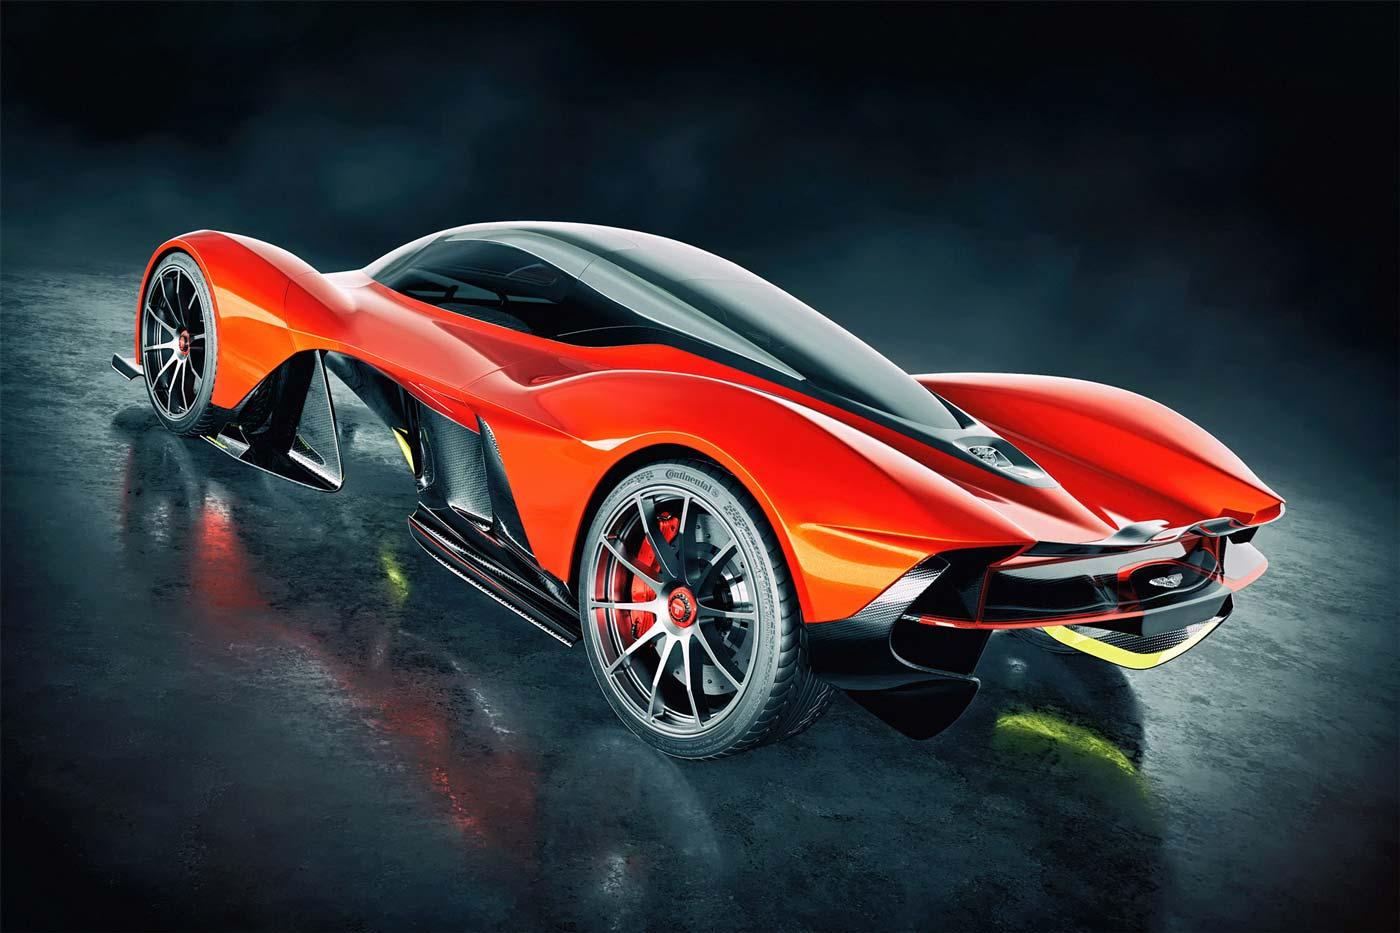 AMRB Red Rear - کاربردهای زیبراش ؛ طراحی اتومبیل با زیبراش